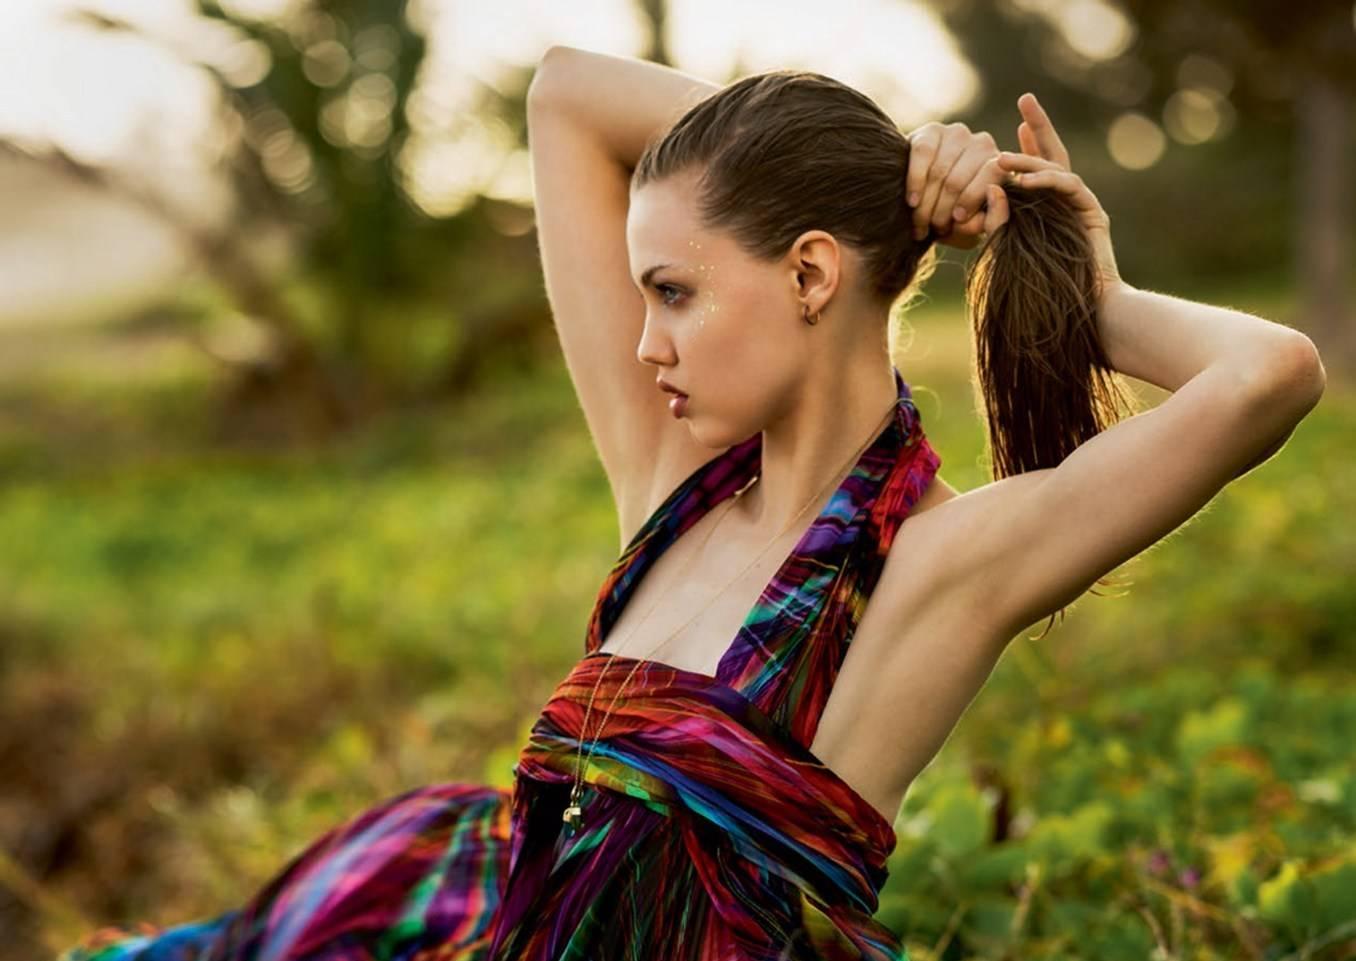 Lindsey Wixson By Gilles Bensimon For Elle Uk June 2017